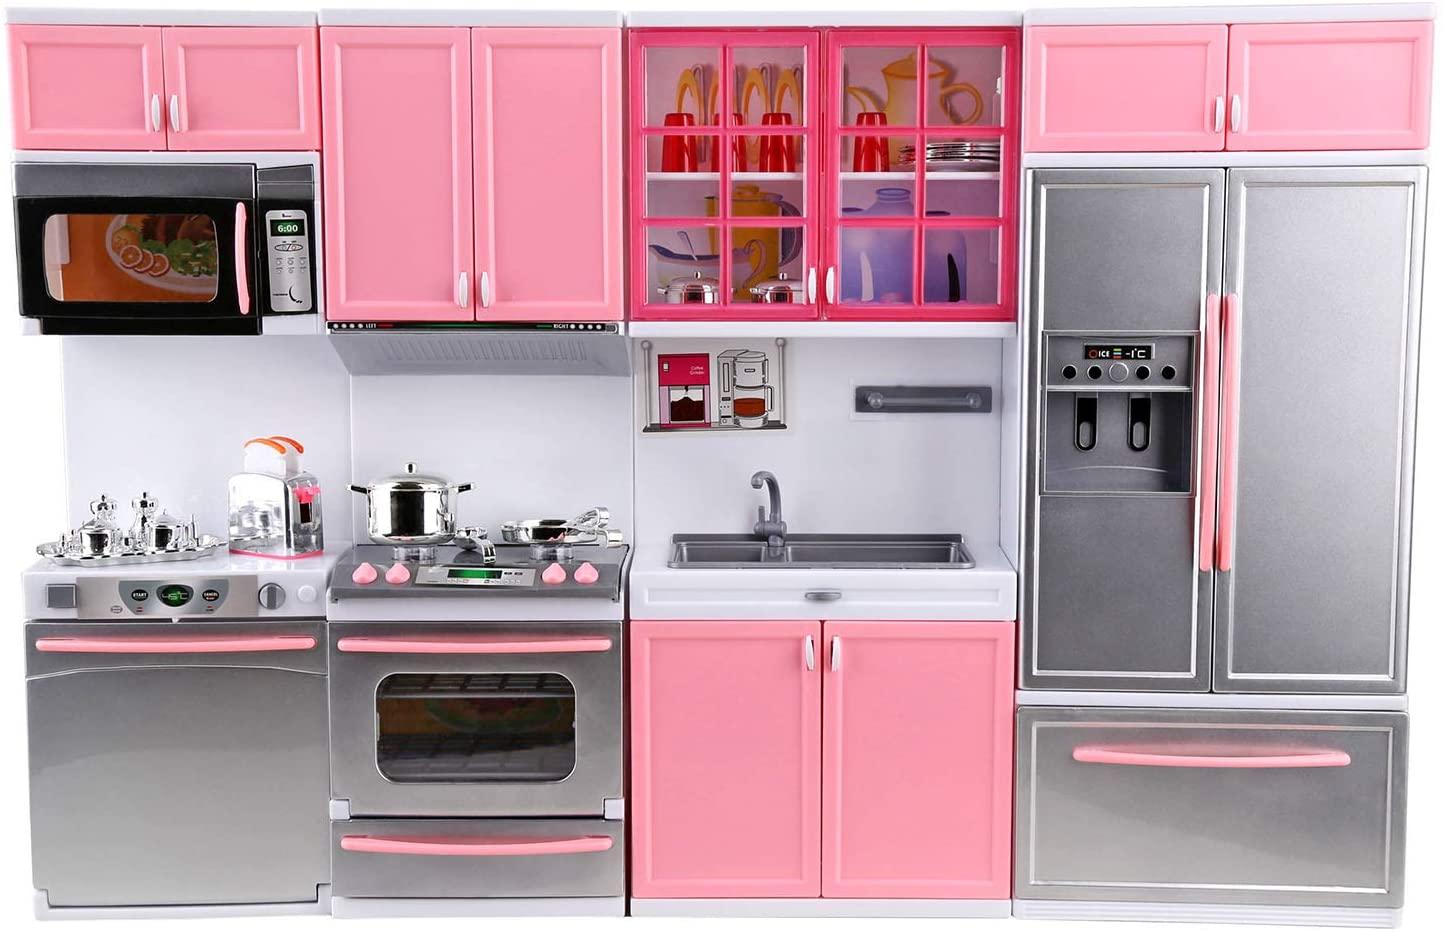 Urban Kit Deluxe Modern Kitchen Playset | Battery Operated Toy Kitchen | Mini Kitchen playset | Dollhouse Kitchen Furniture | Battery Kitchen | Deluxe Kitchen Pink